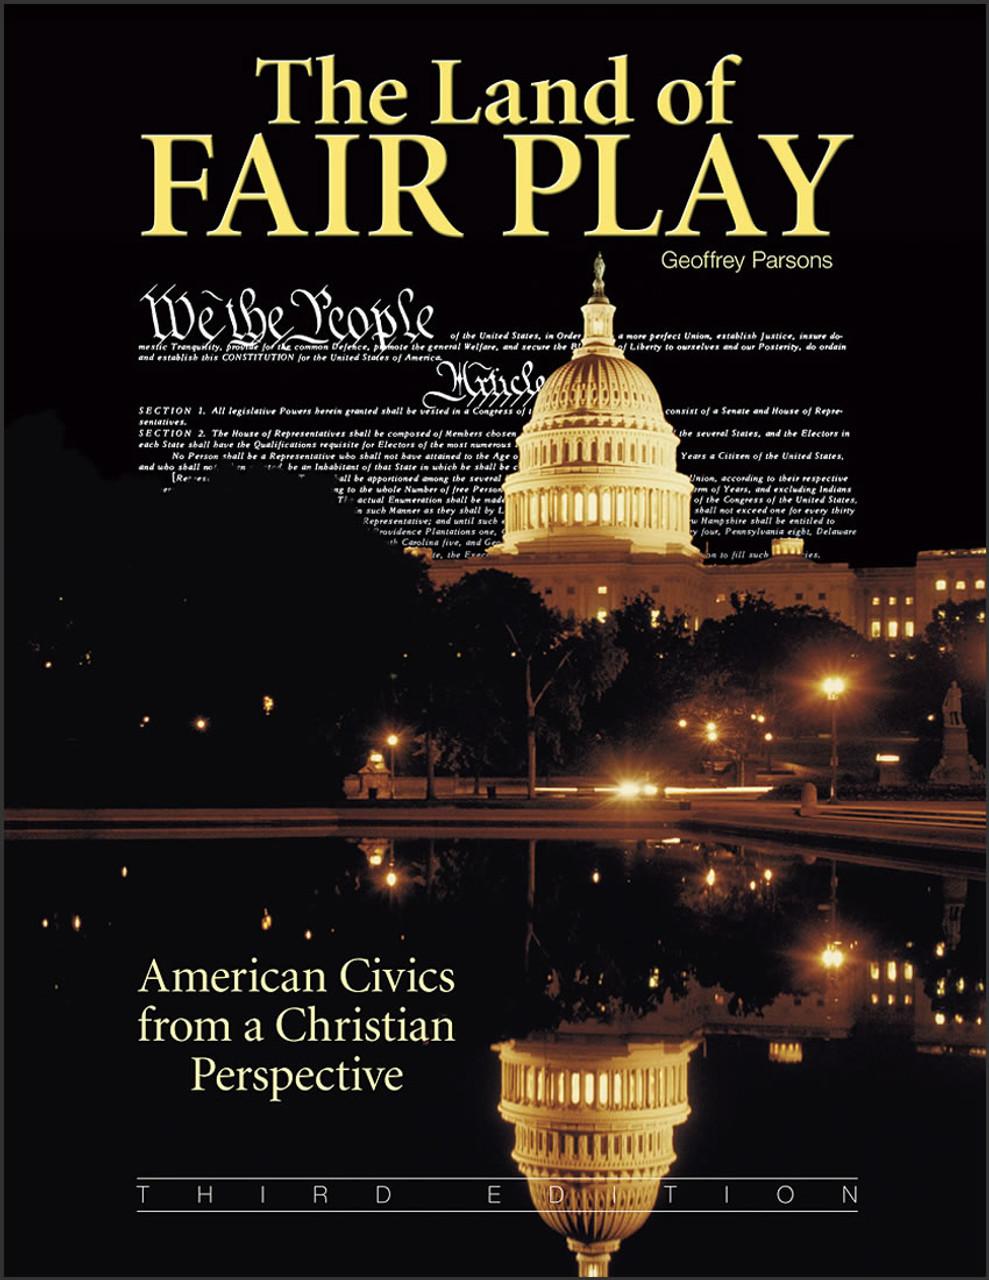 The Land of Fair Play, 3rd edition